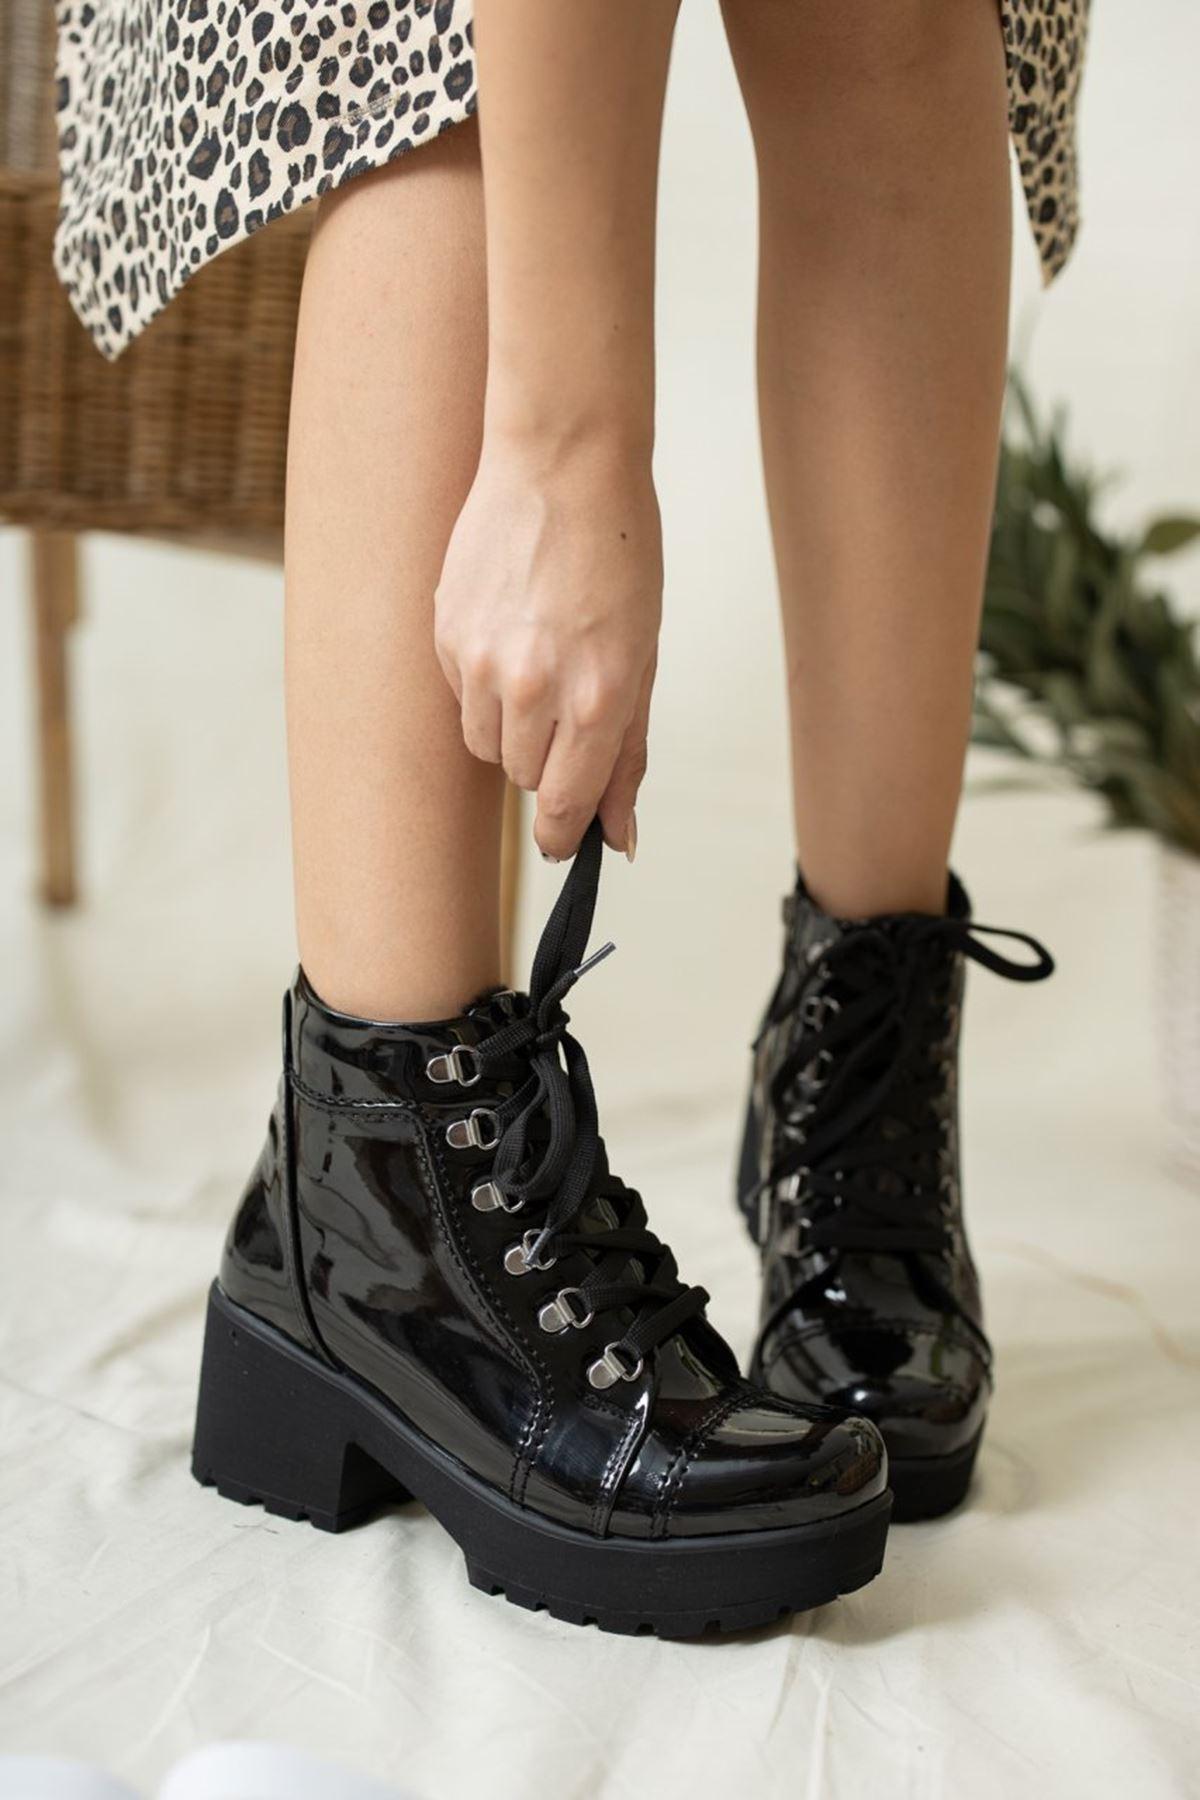 Kadın Comfort Kalın Taban Rugan Siyah Bot